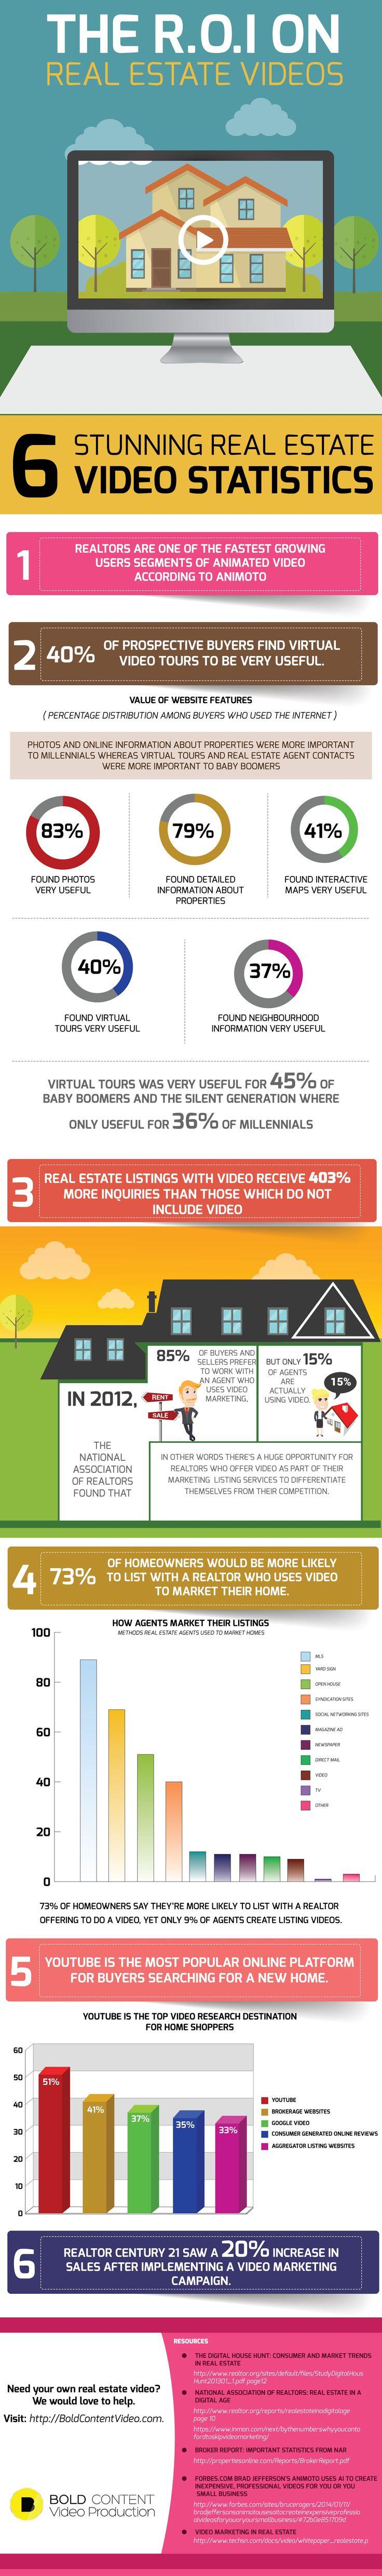 Real Estate Video Marketing Statistics For 2016